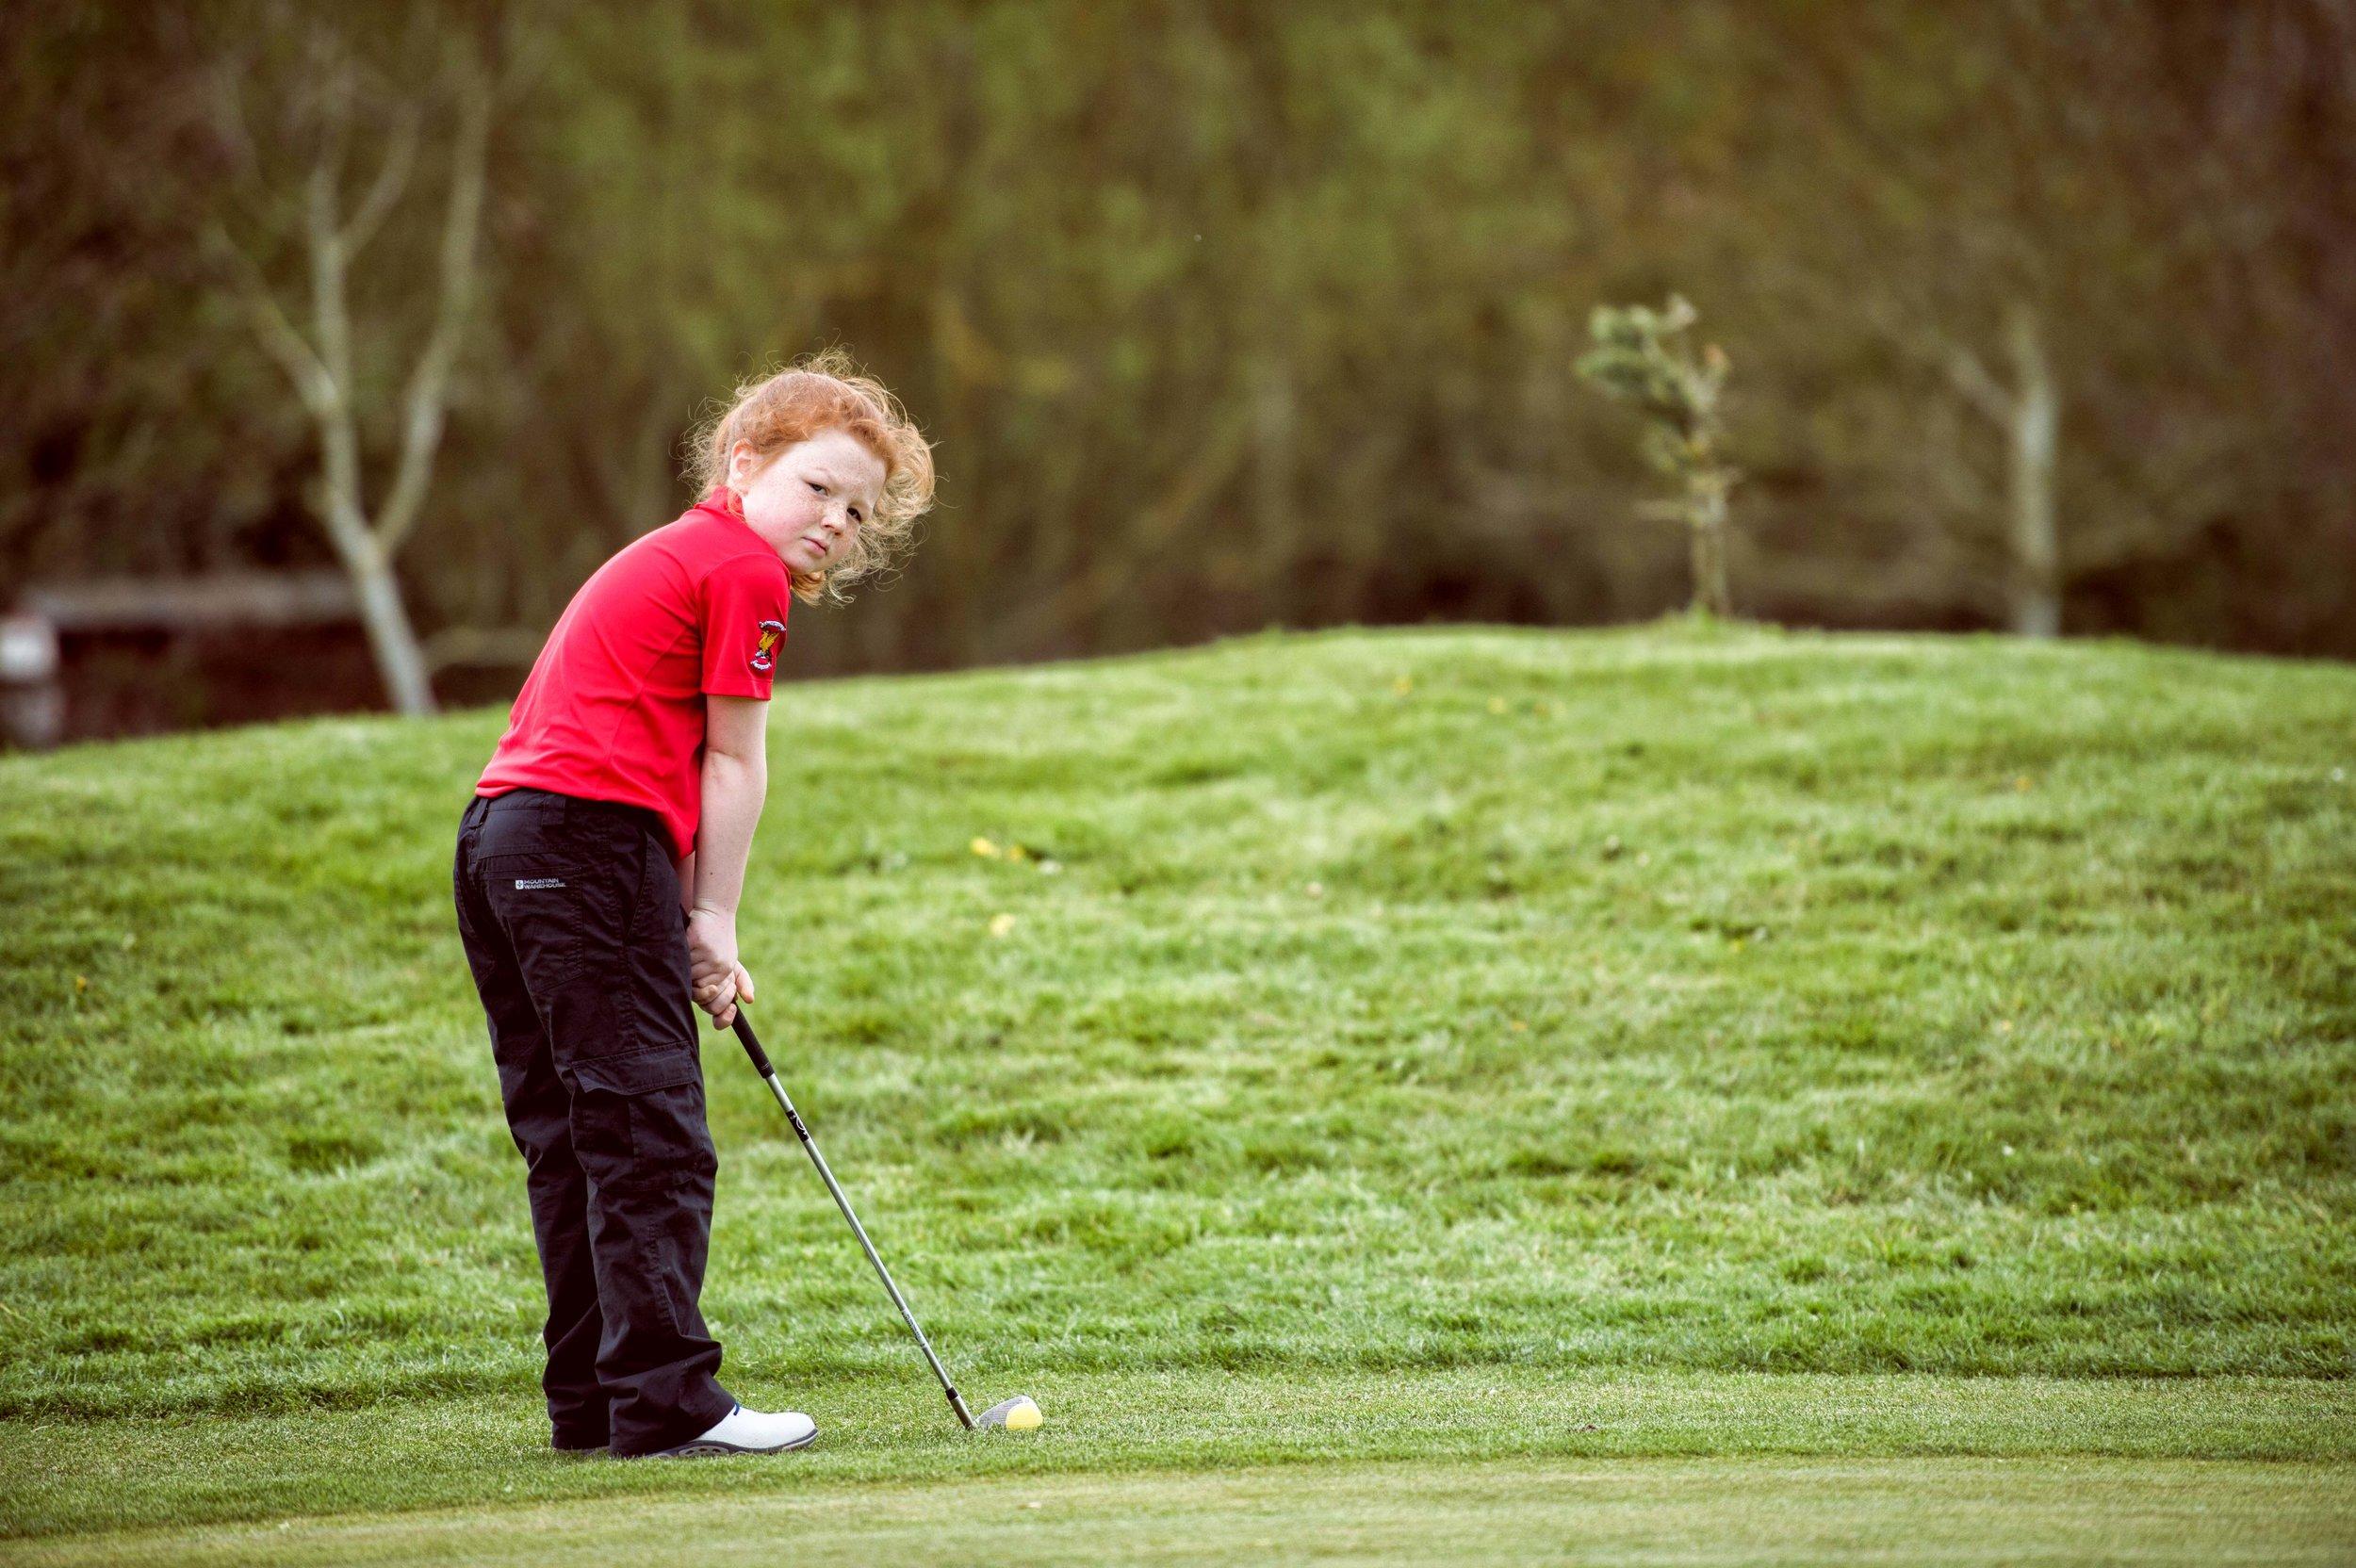 Russell Adams Golf Academy Junior Aniko Towers Golf Photo-446.jpg